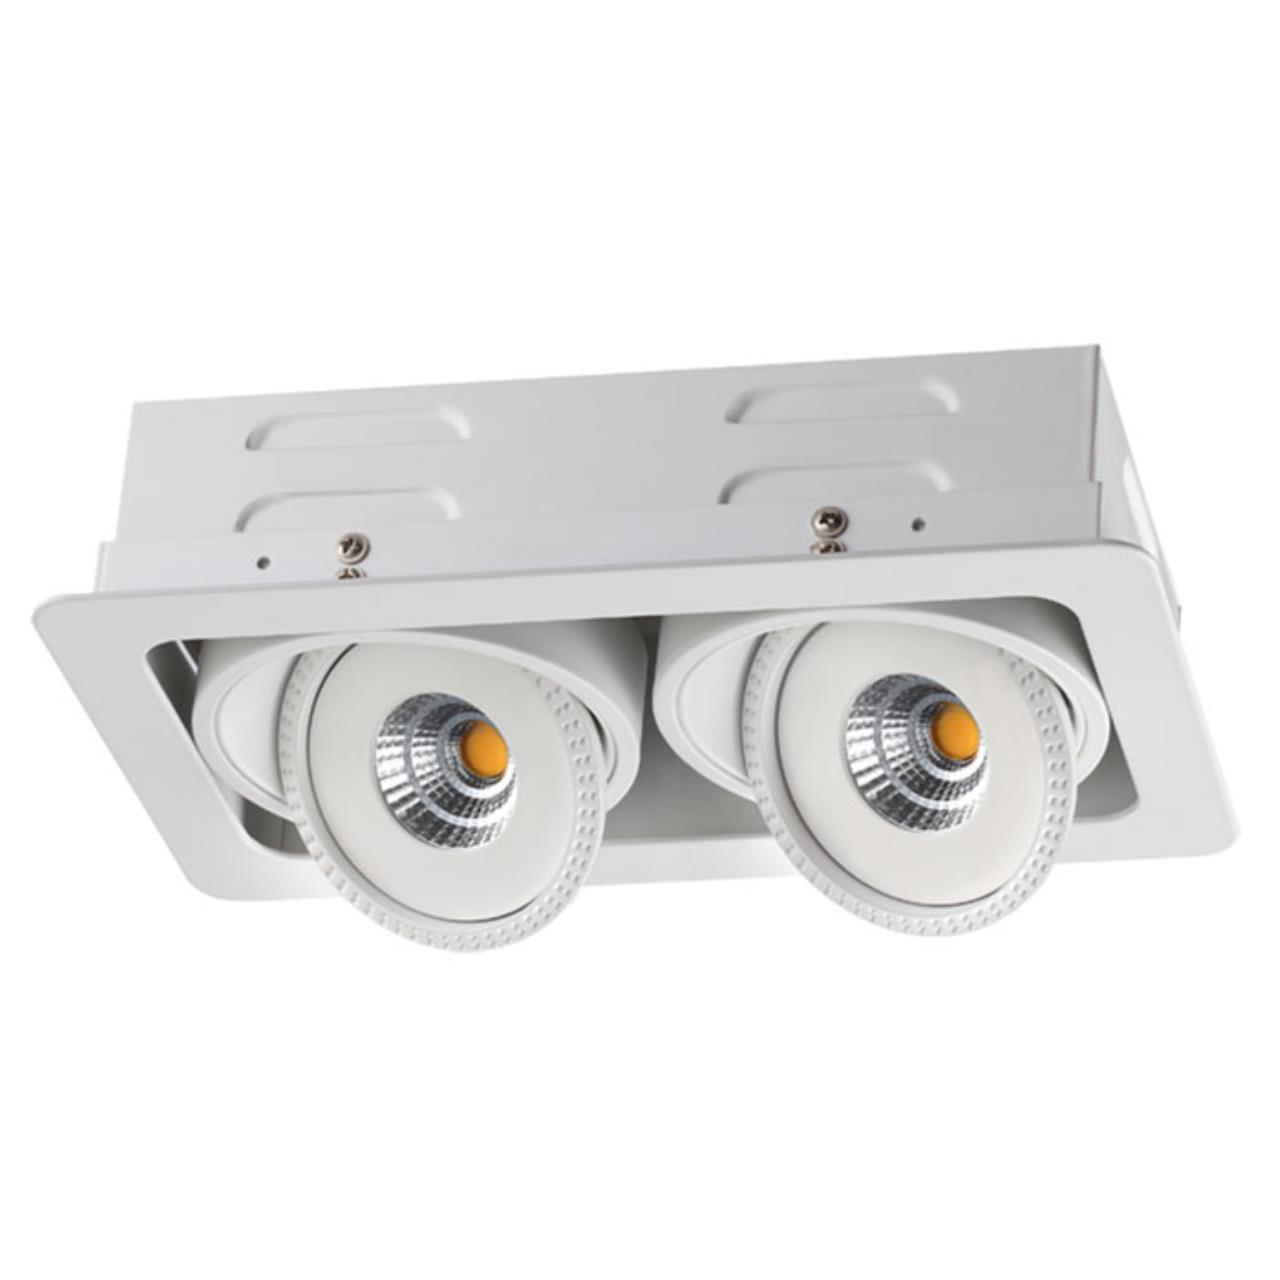 357581 SPOT NT18 081 белый Встраиваемый светильник IP20 LED 3000K 2*15W 85-265V GESSO